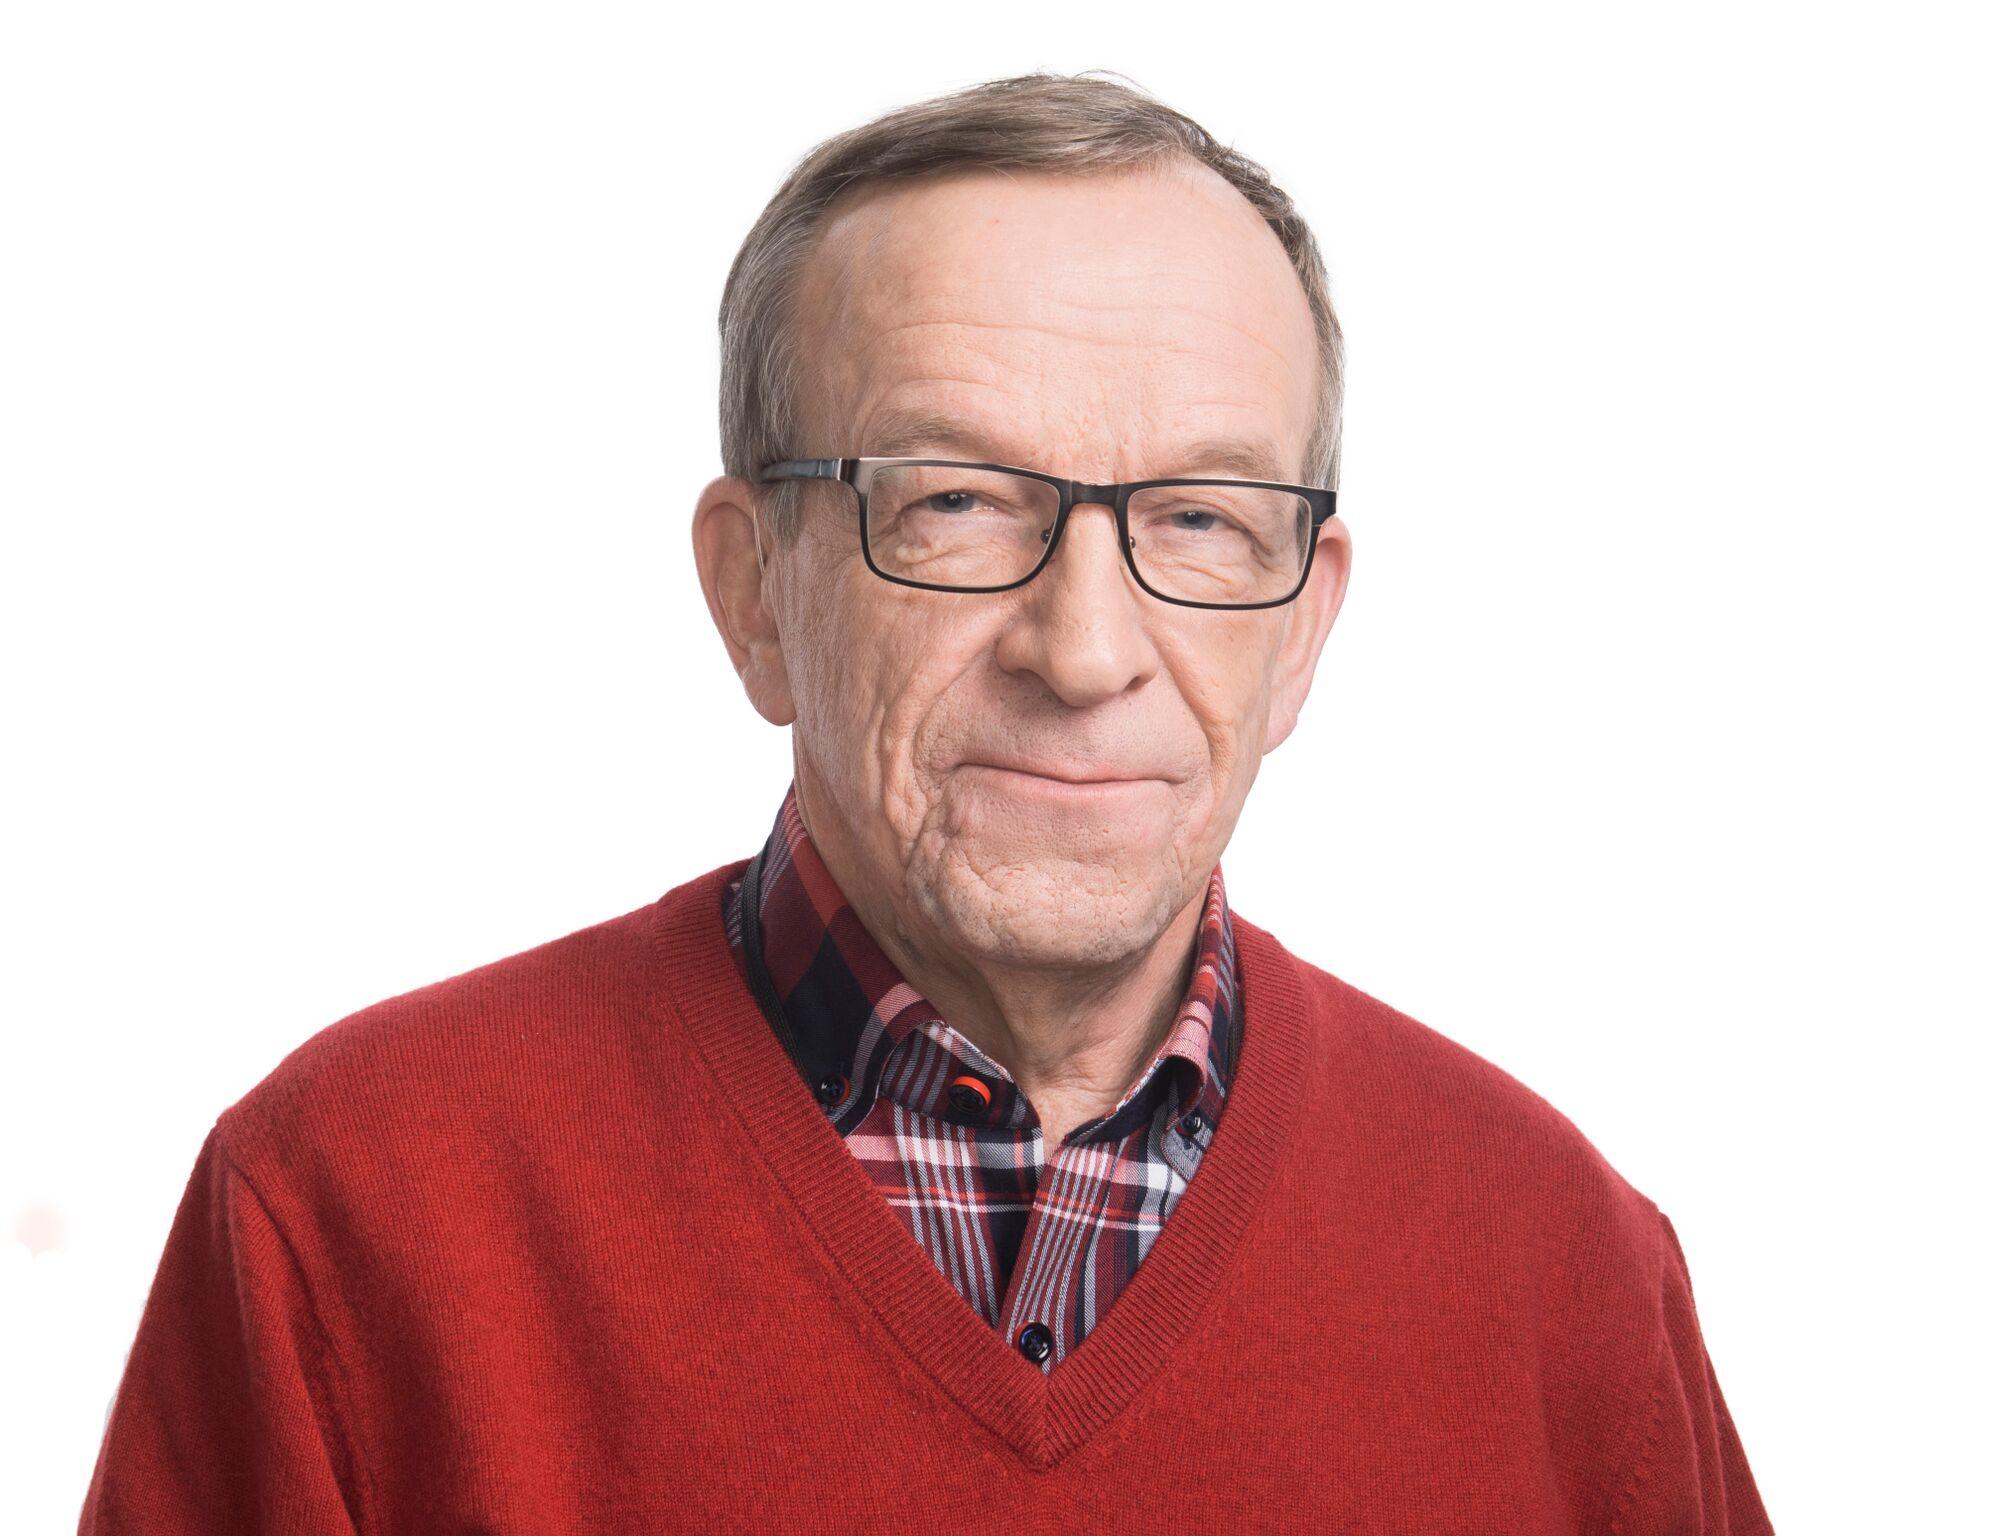 Picture of Timo Mäkinen